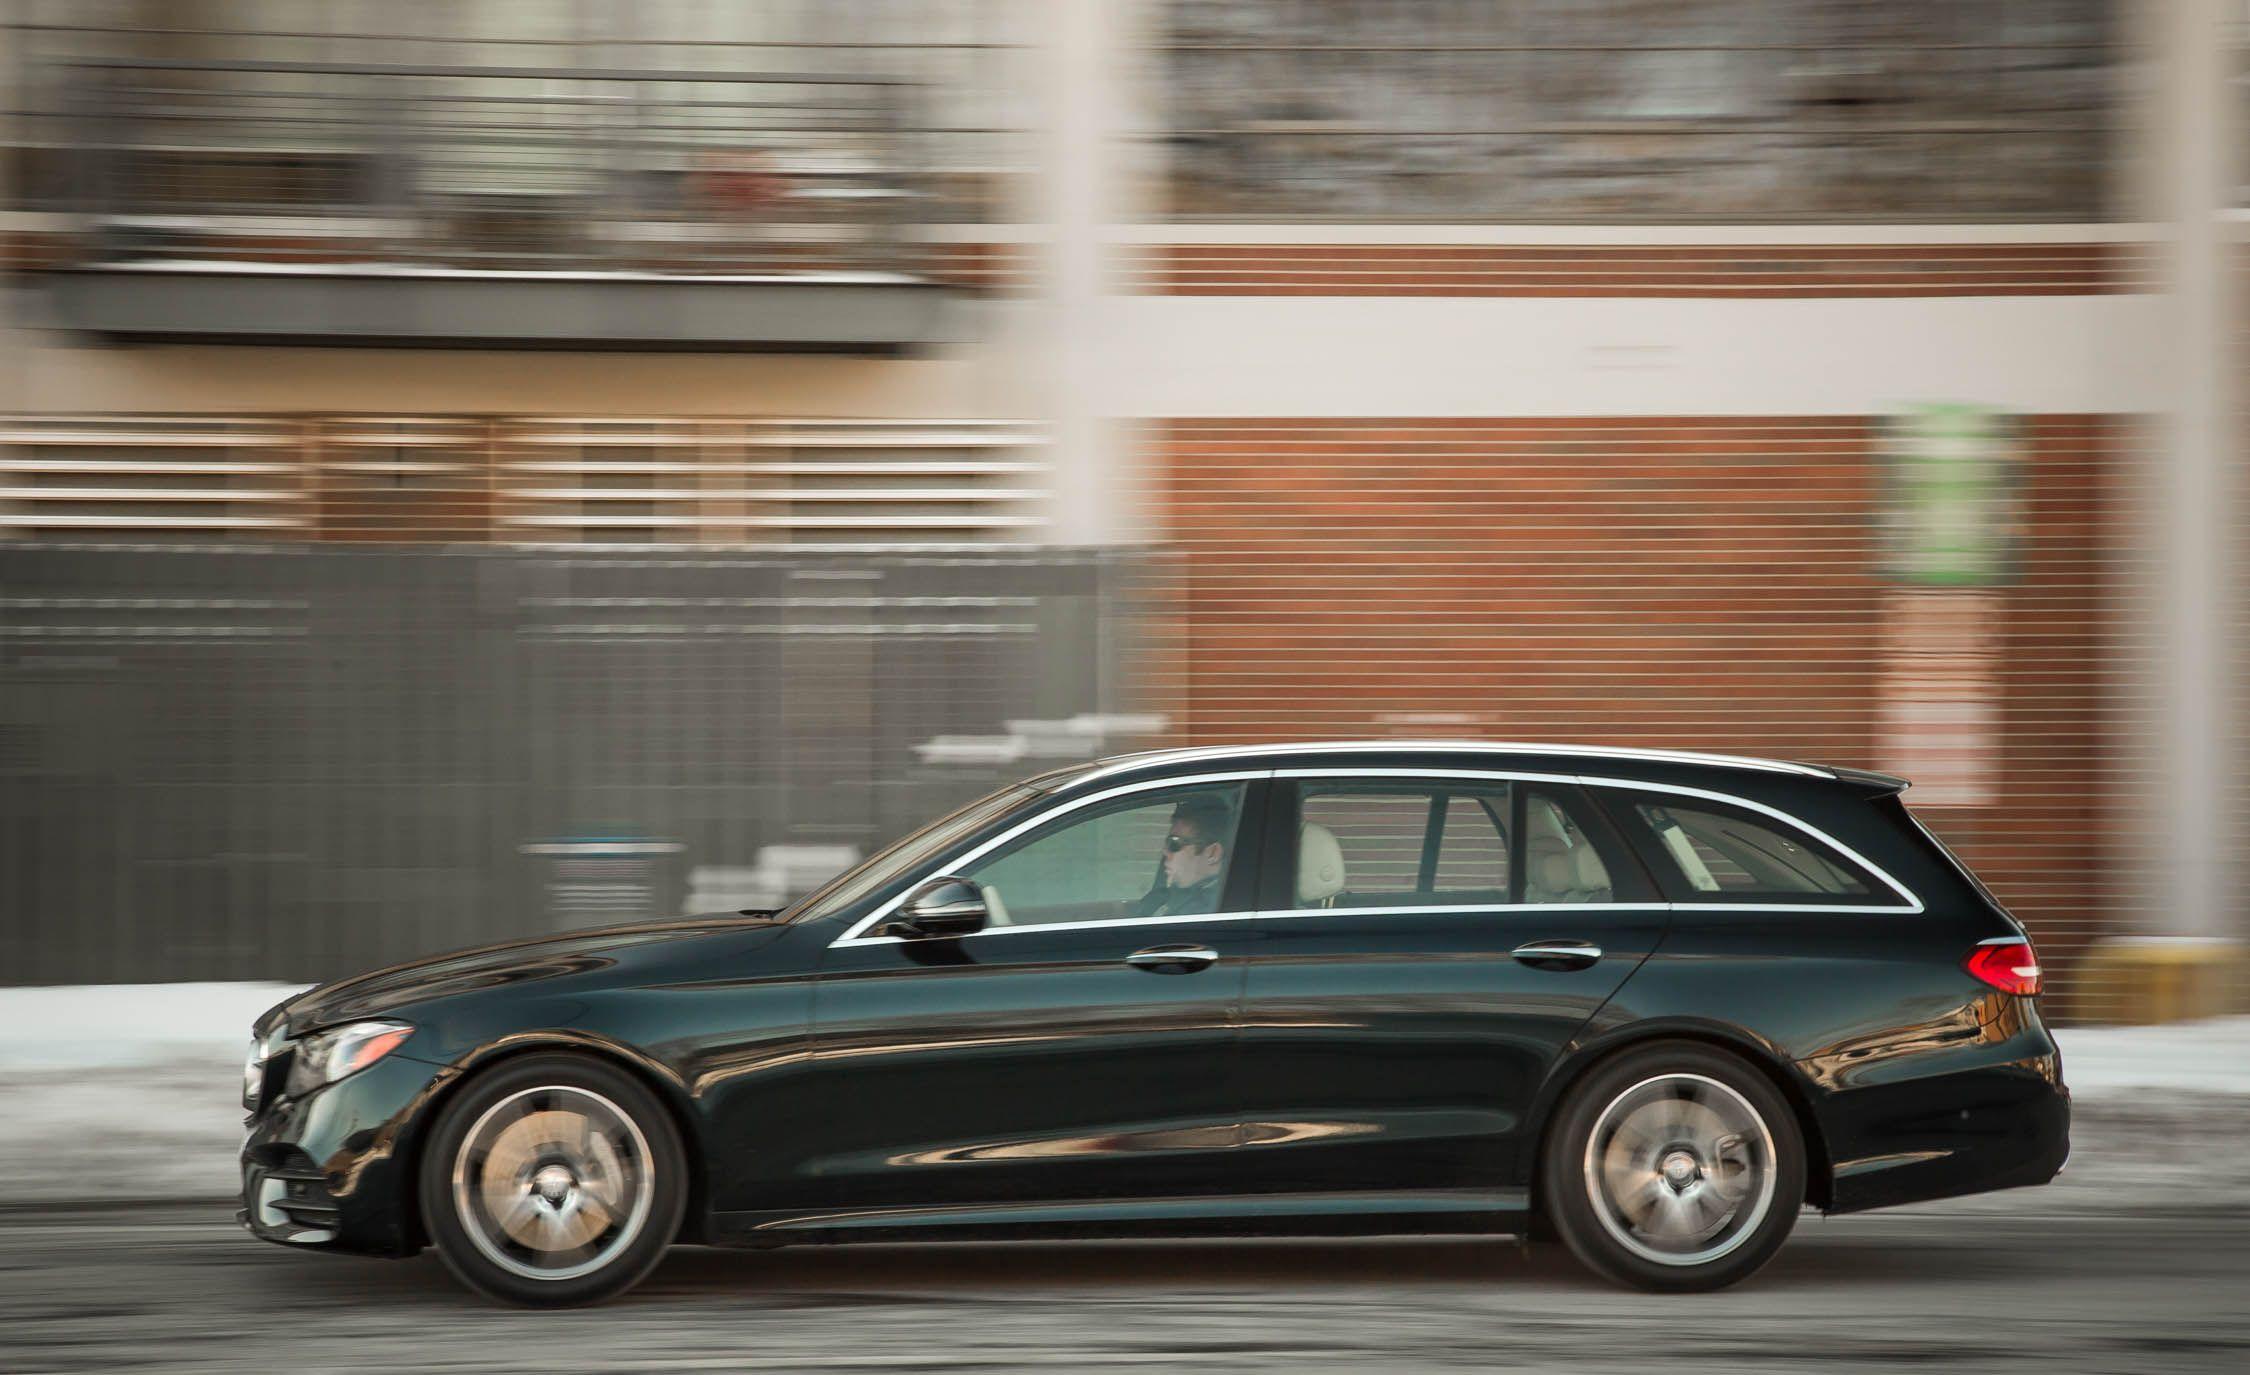 2018 Mercedes-Benz E-class Wagon | Fuel Economy and Driving Range ...